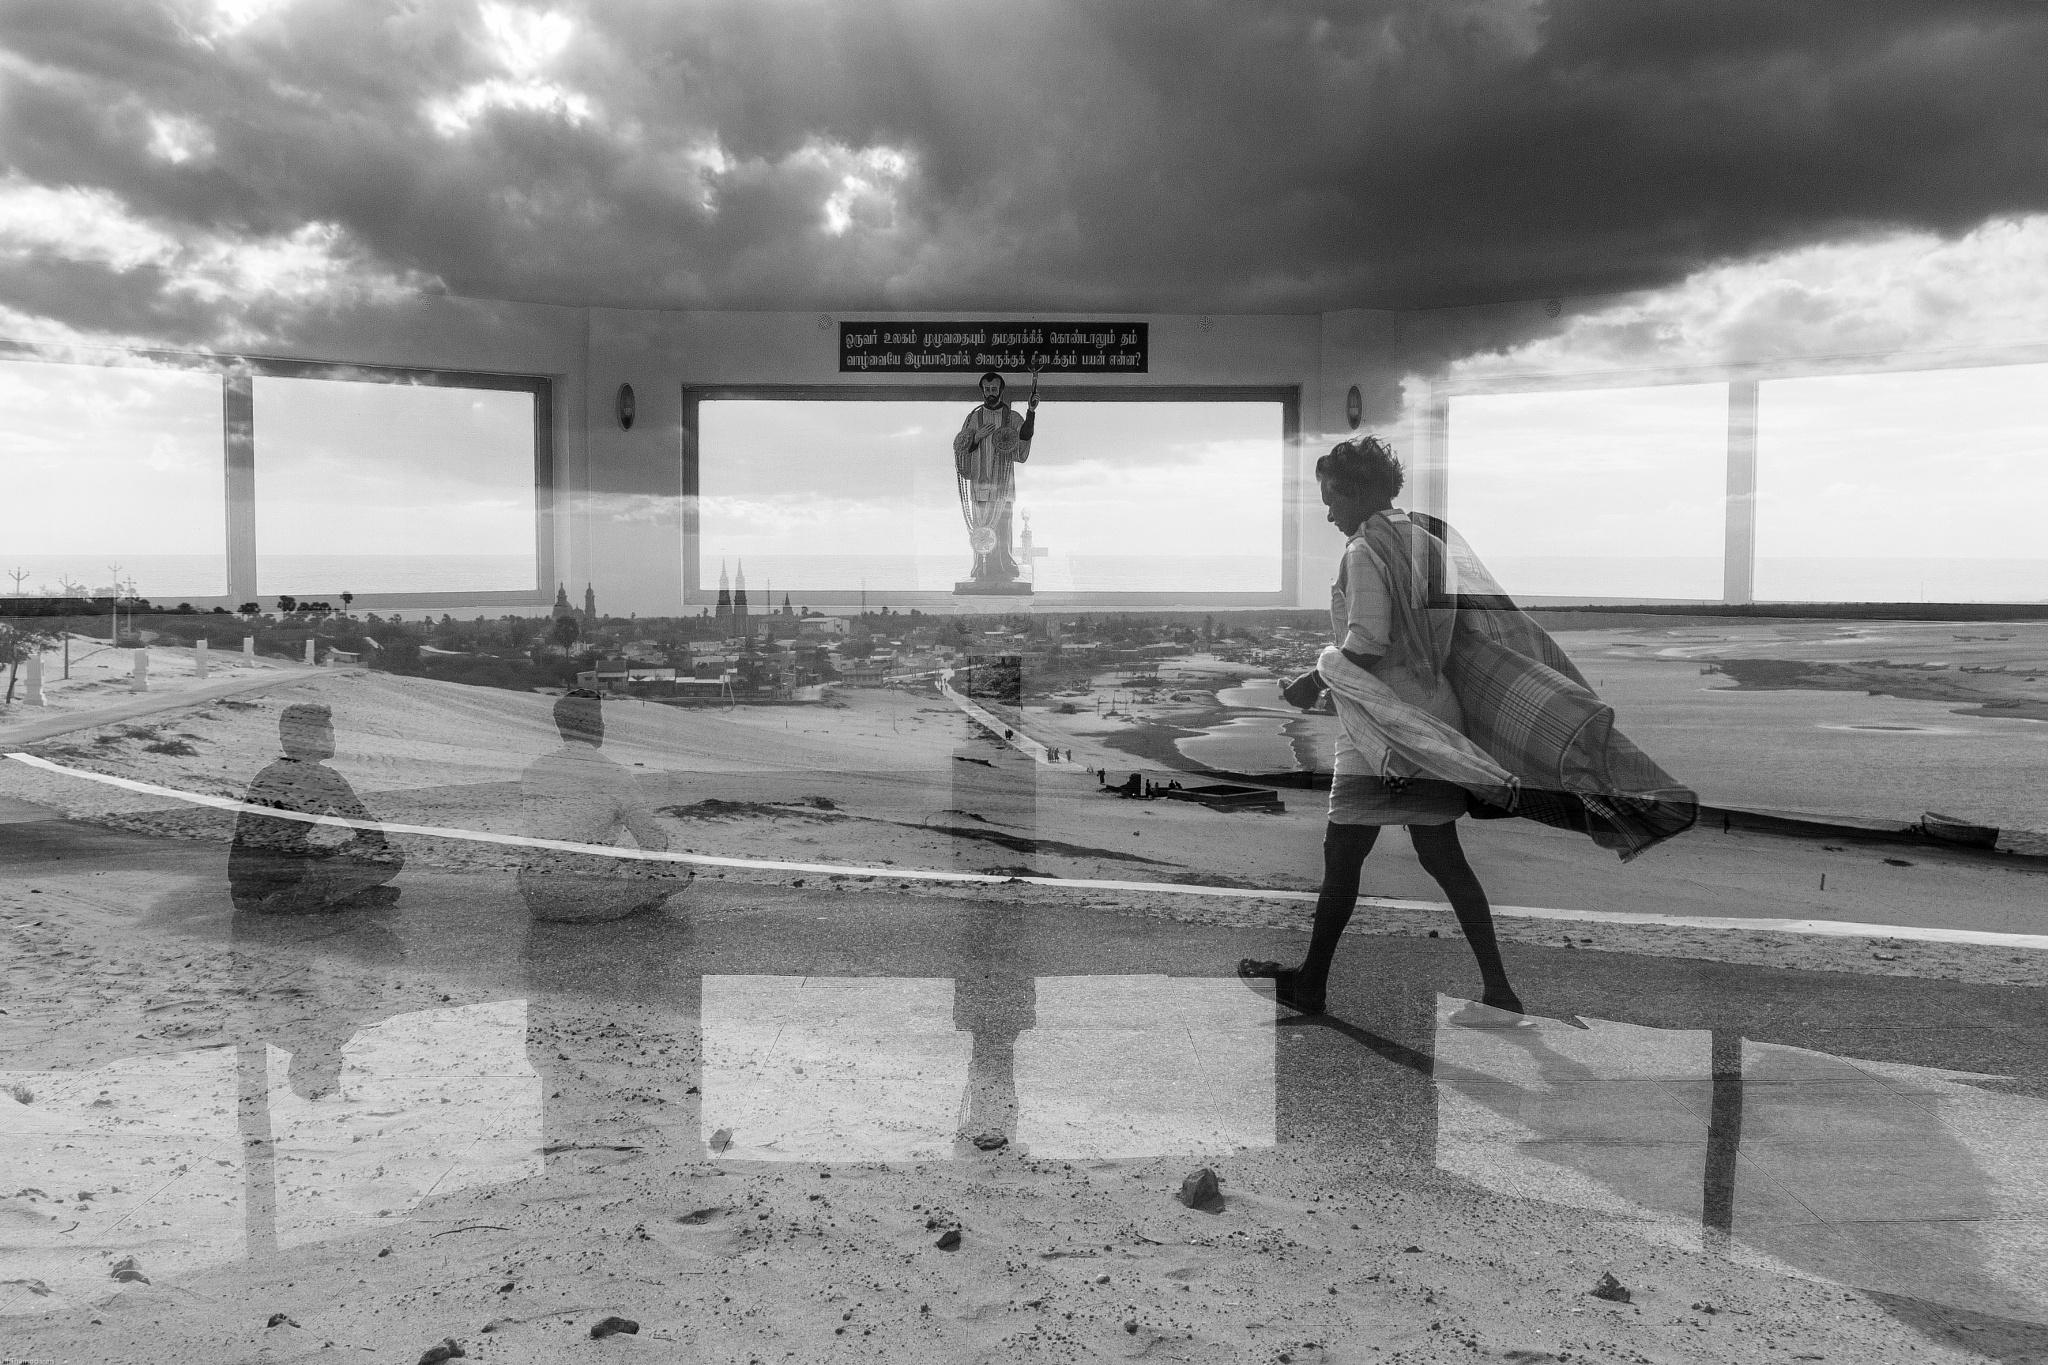 Double Exposure by Sarathi Thamodaran